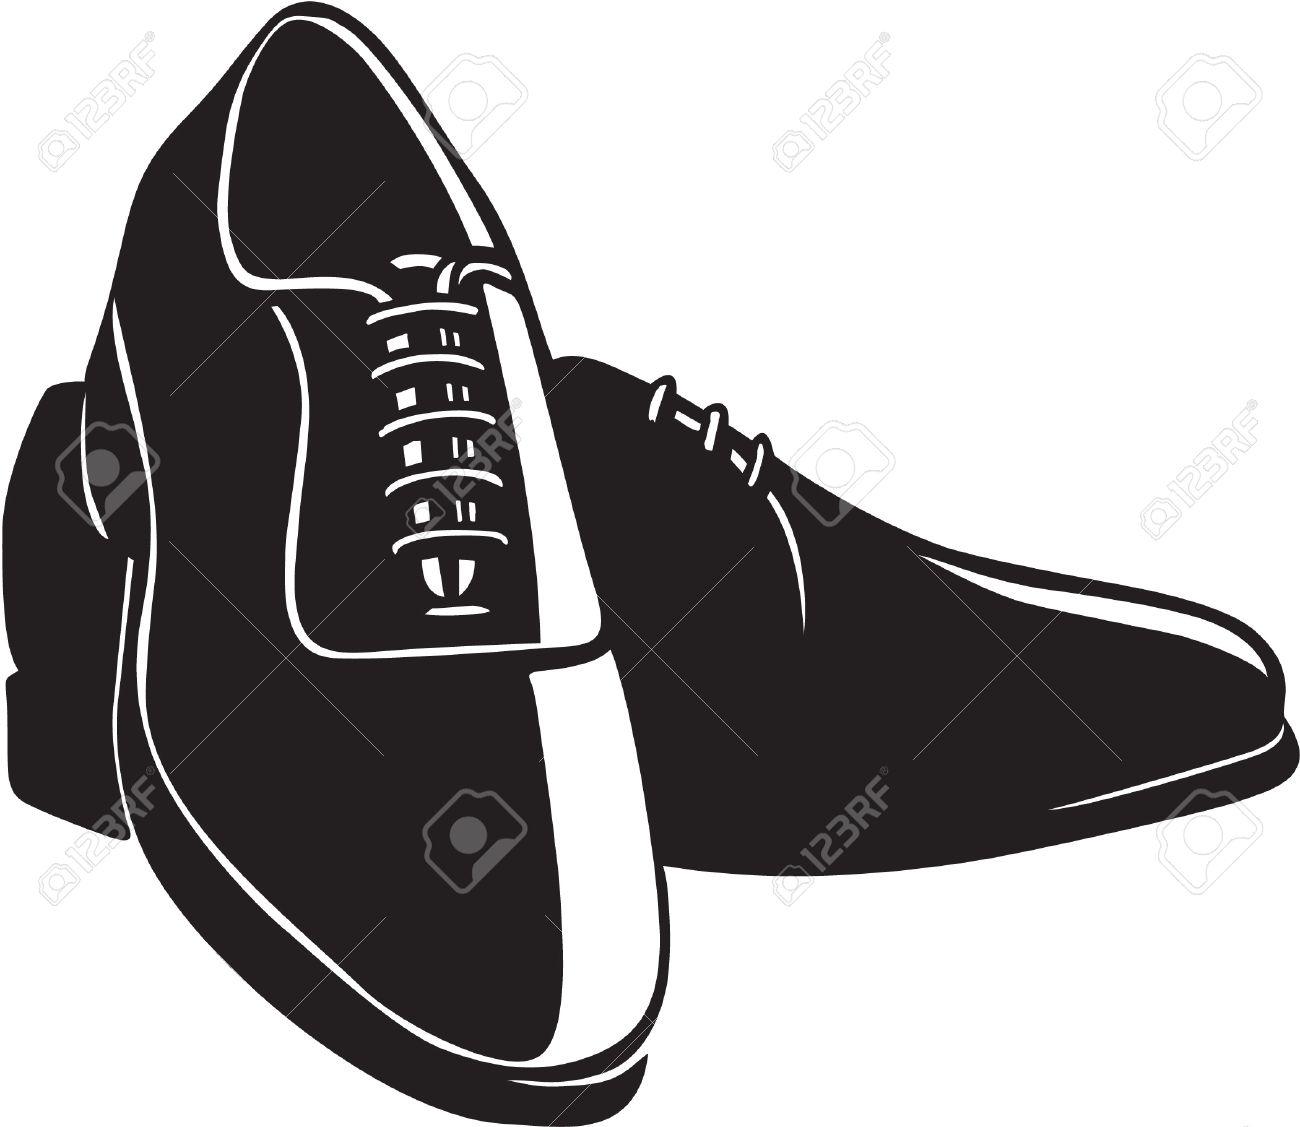 Dress shoes clipart 4 » Clipart Station.